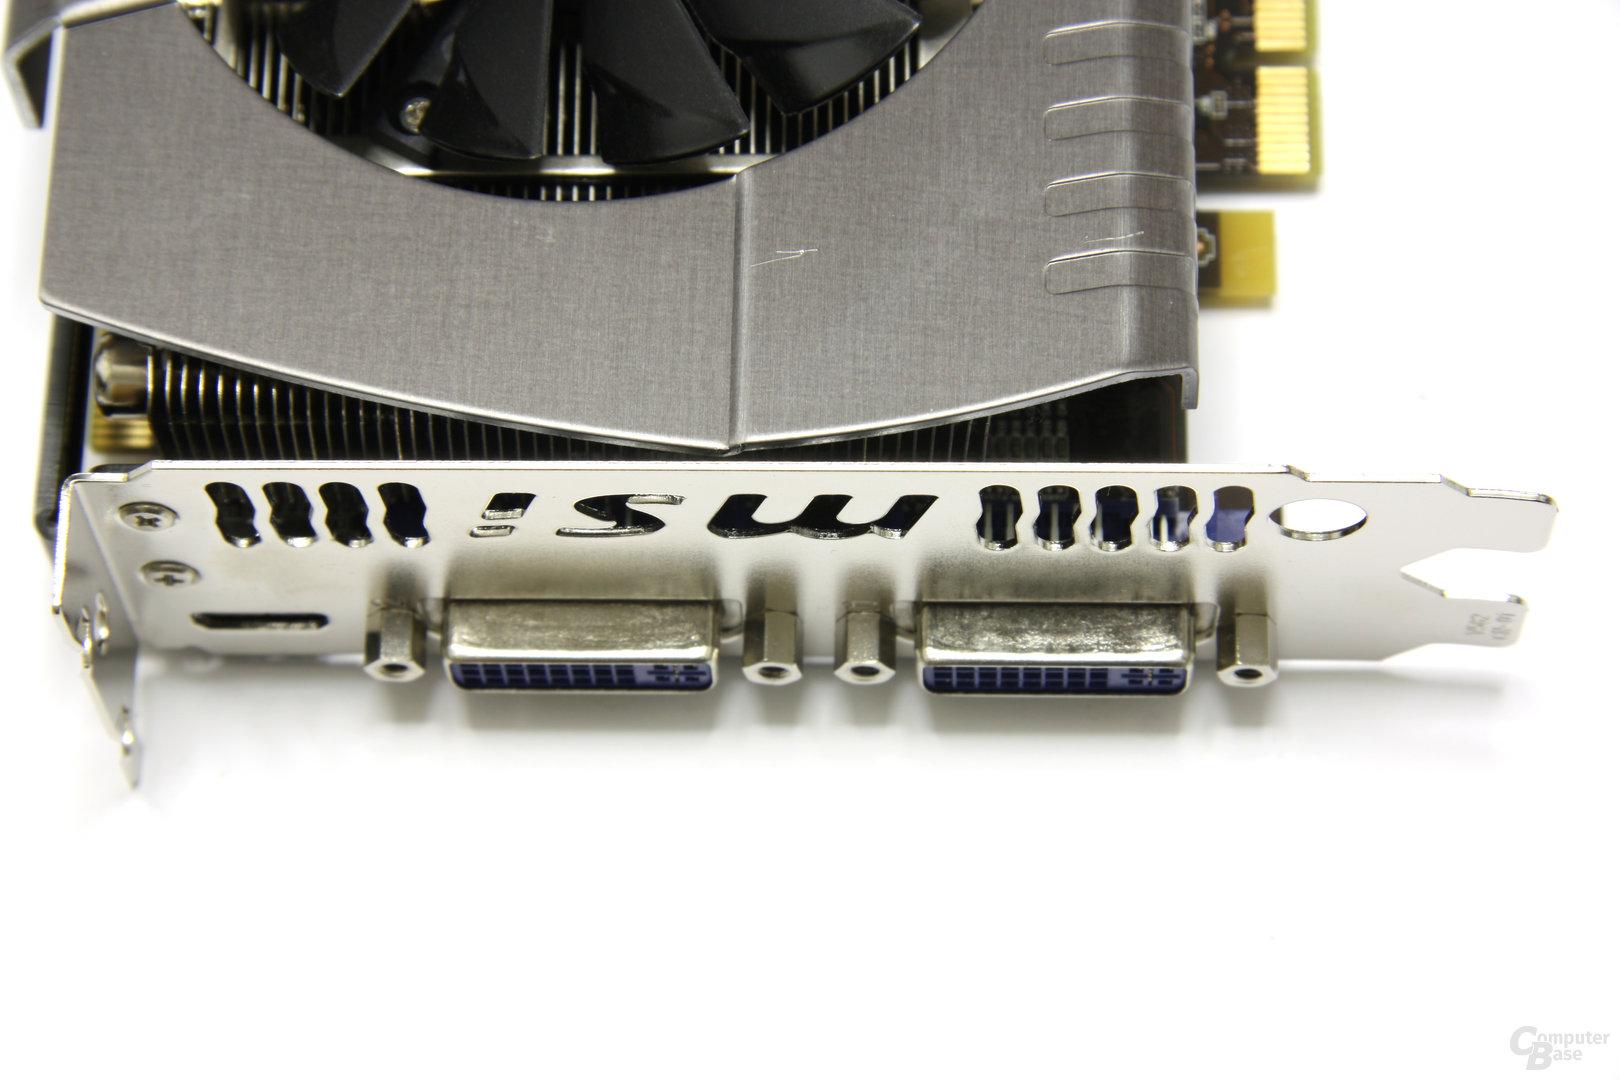 GeForce GTX 560 Ti 448 Core TFIII PE OC Anschlüsse